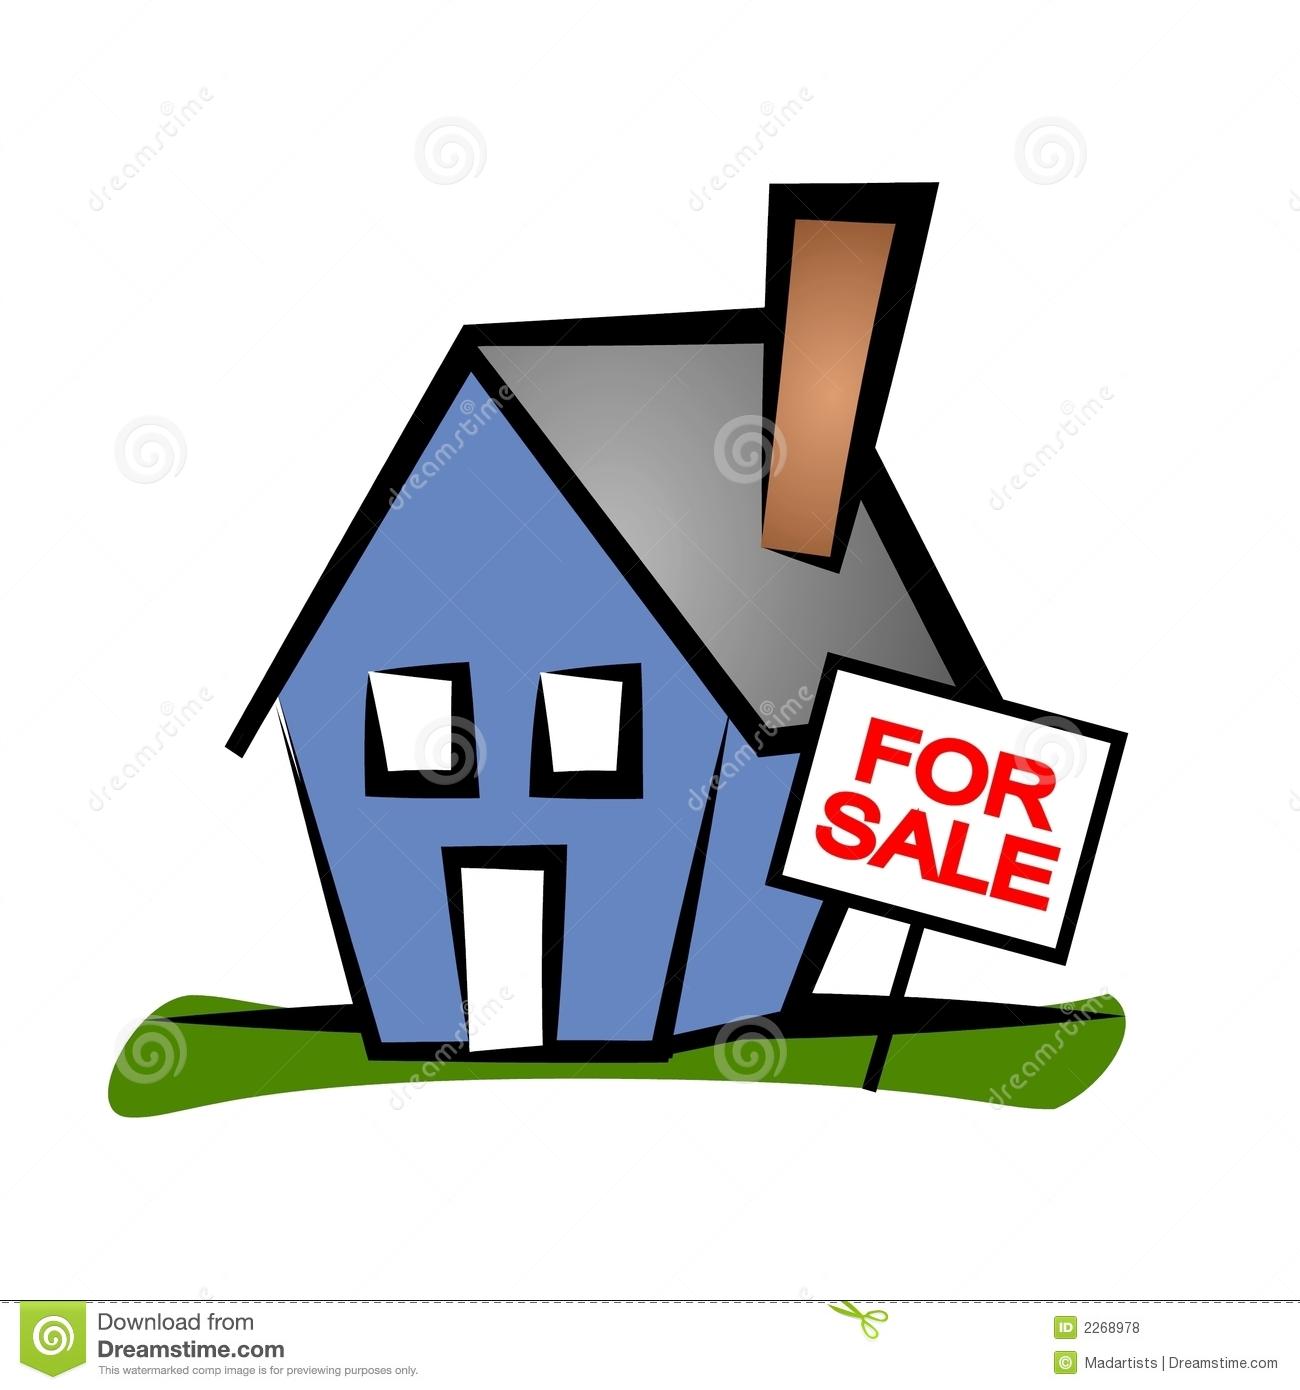 Clip Art Real Estate Illustration Of A B-Clip Art Real Estate Illustration Of A Blue House With A For Sale-1